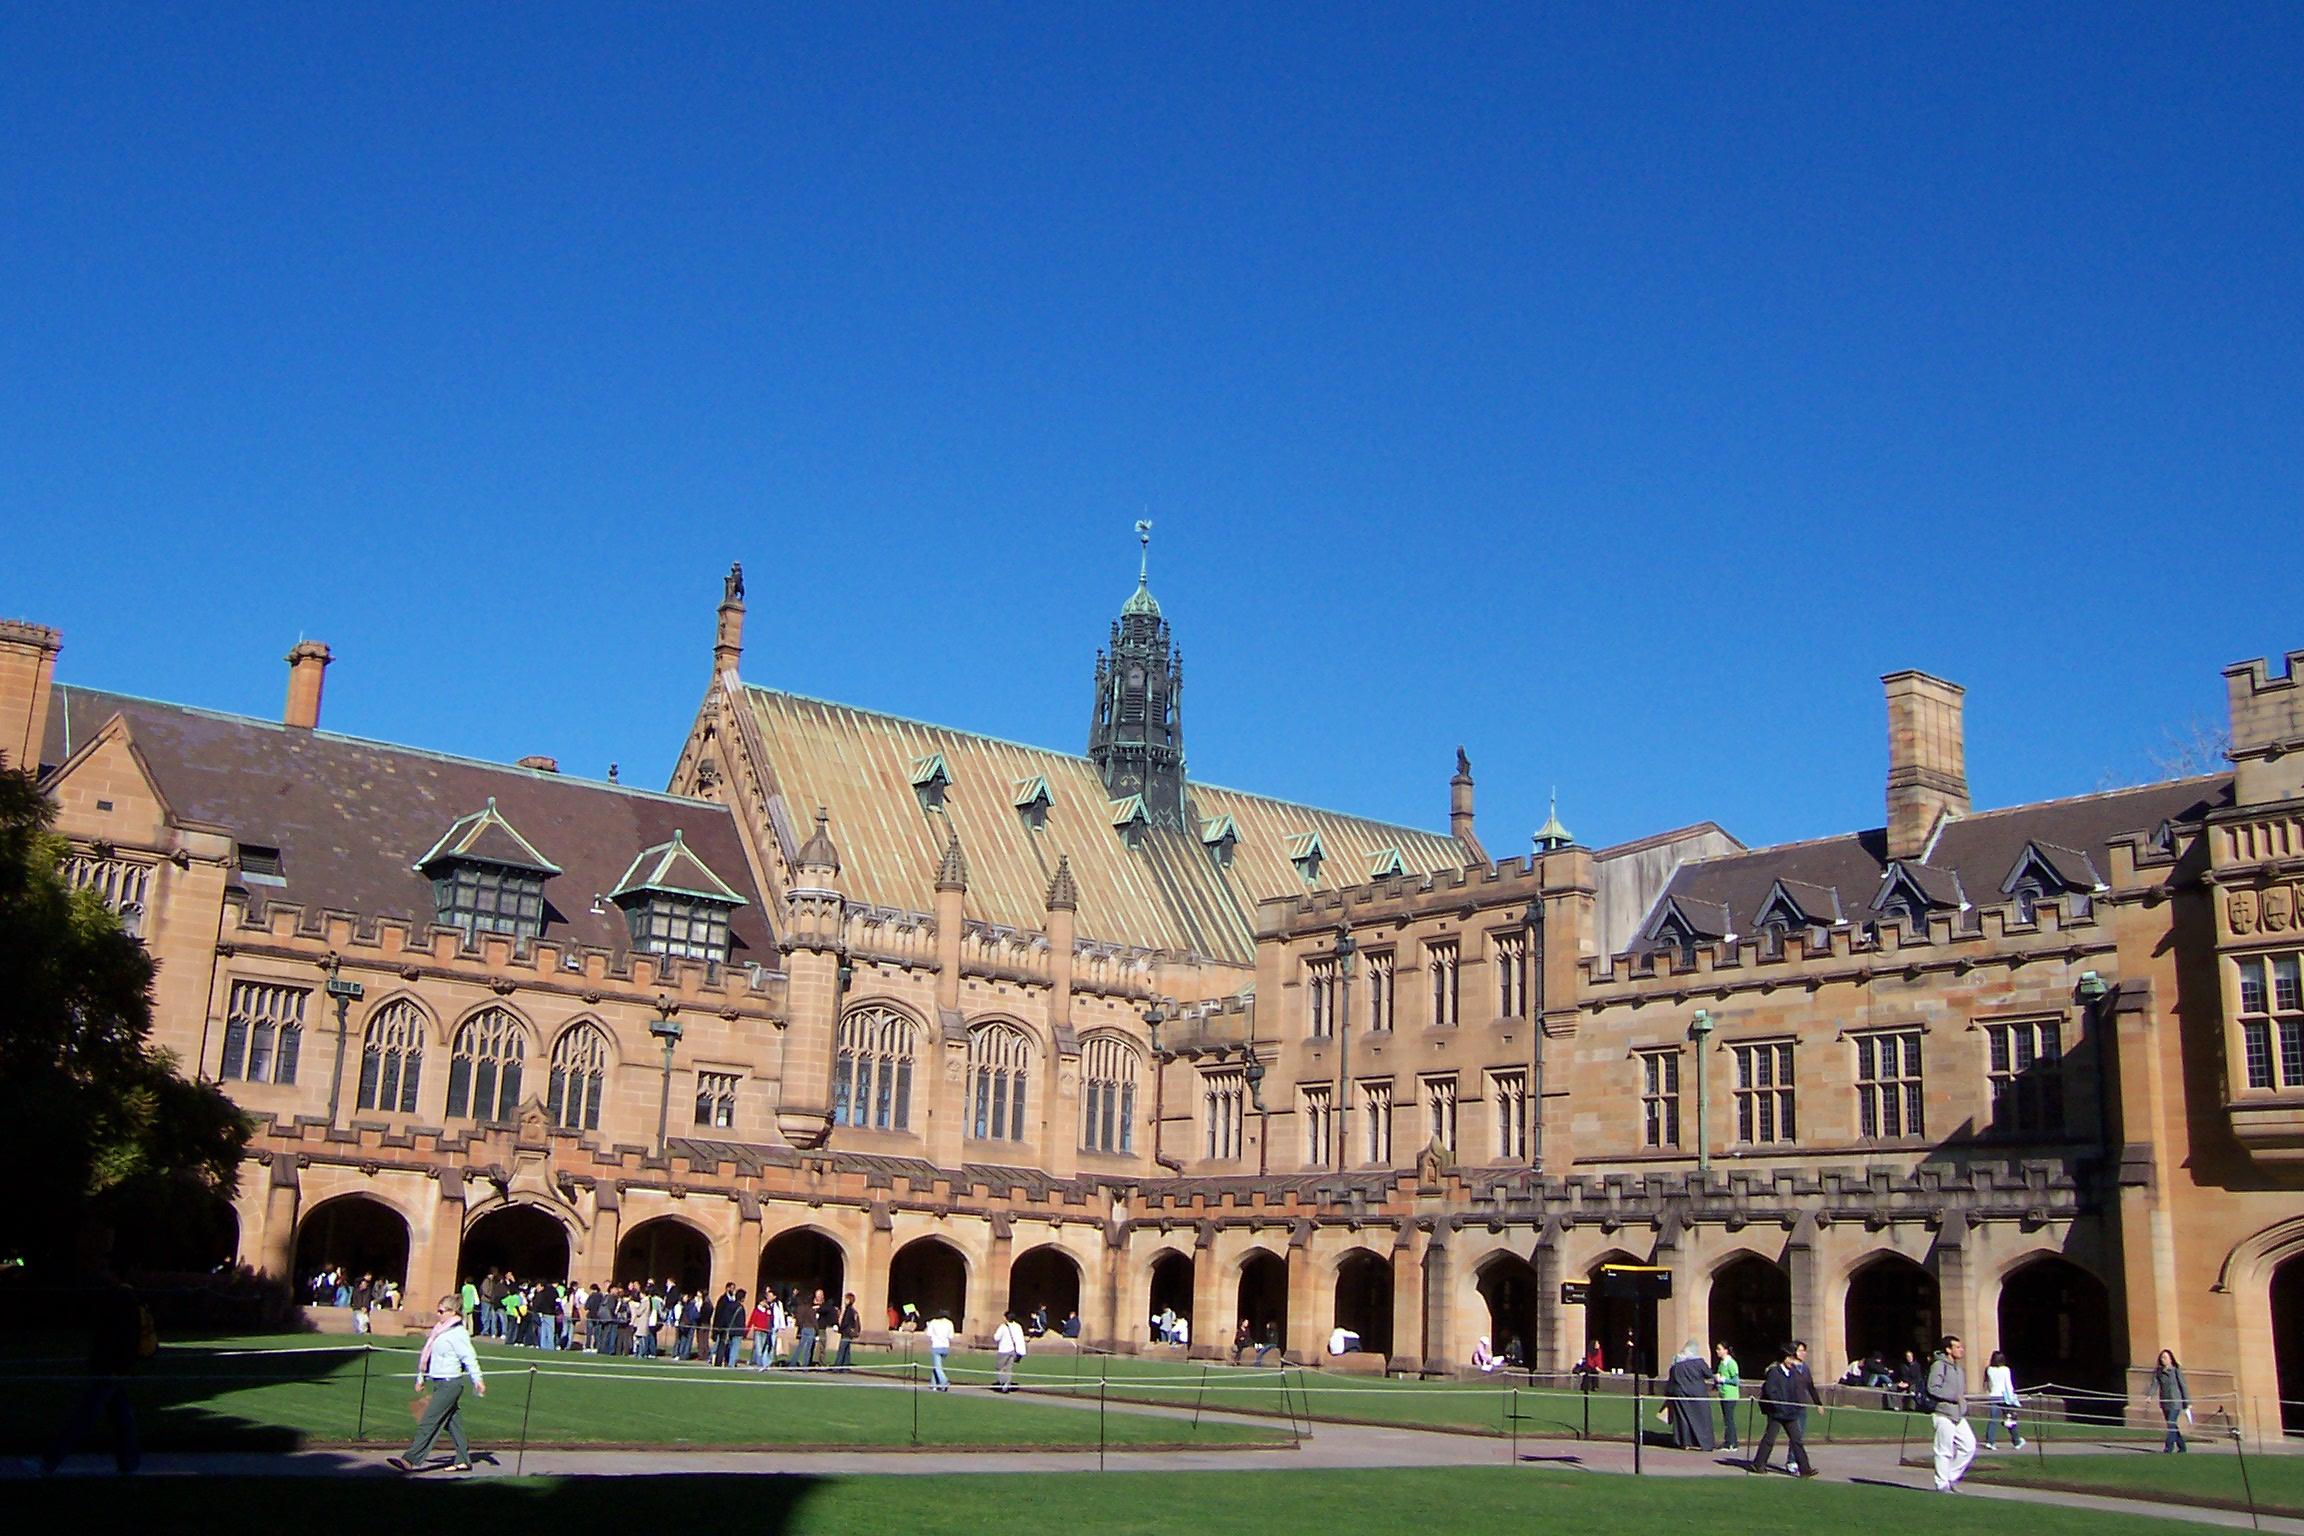 The University of Sydney Quadrangle